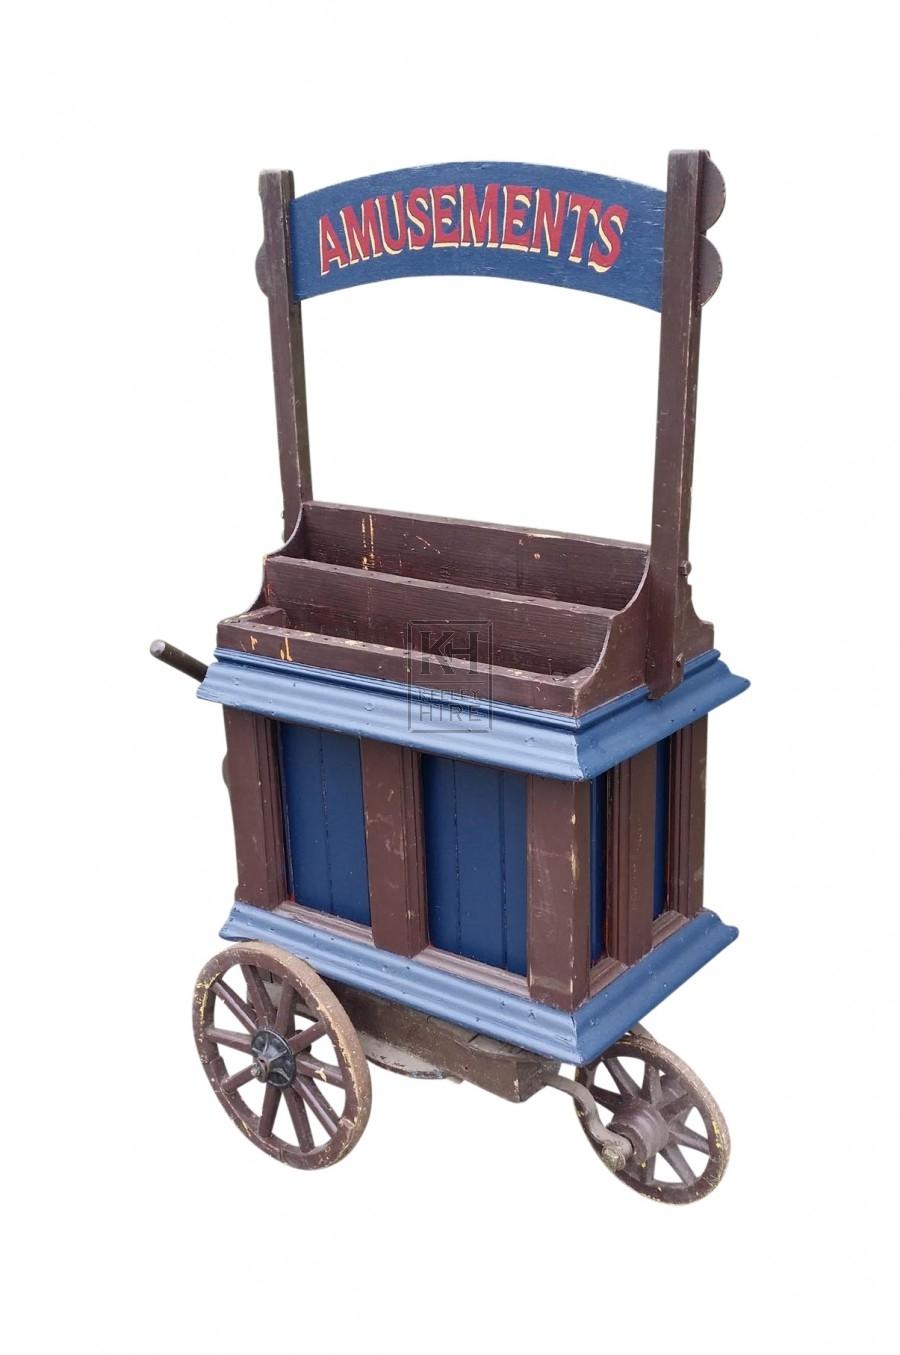 Amusements cart